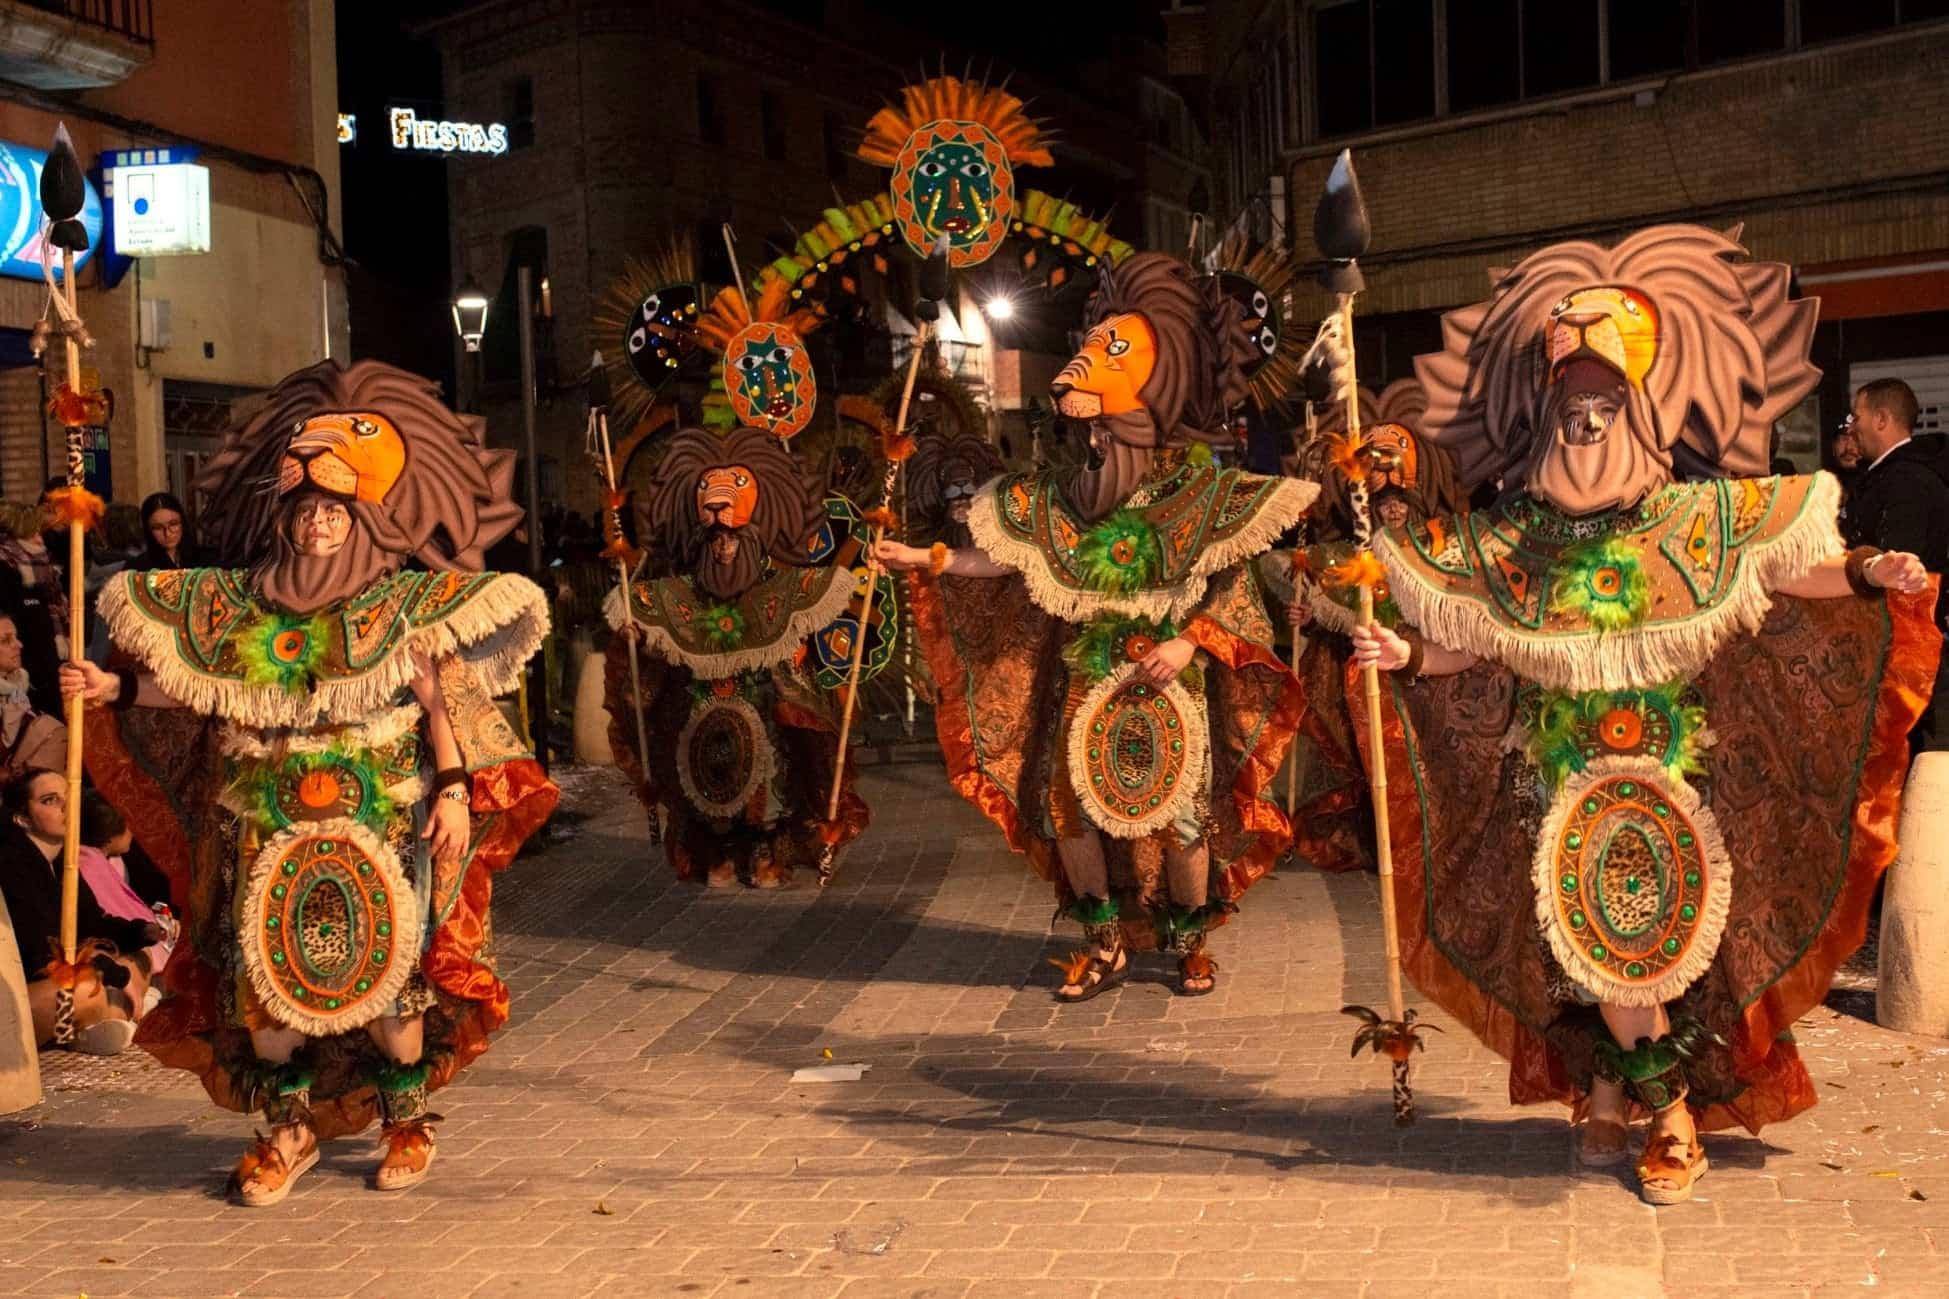 Carnaval de herencia 2020 ofertorio 99 - Selección de fotografías del Ofertorio del Carnaval de Herencia